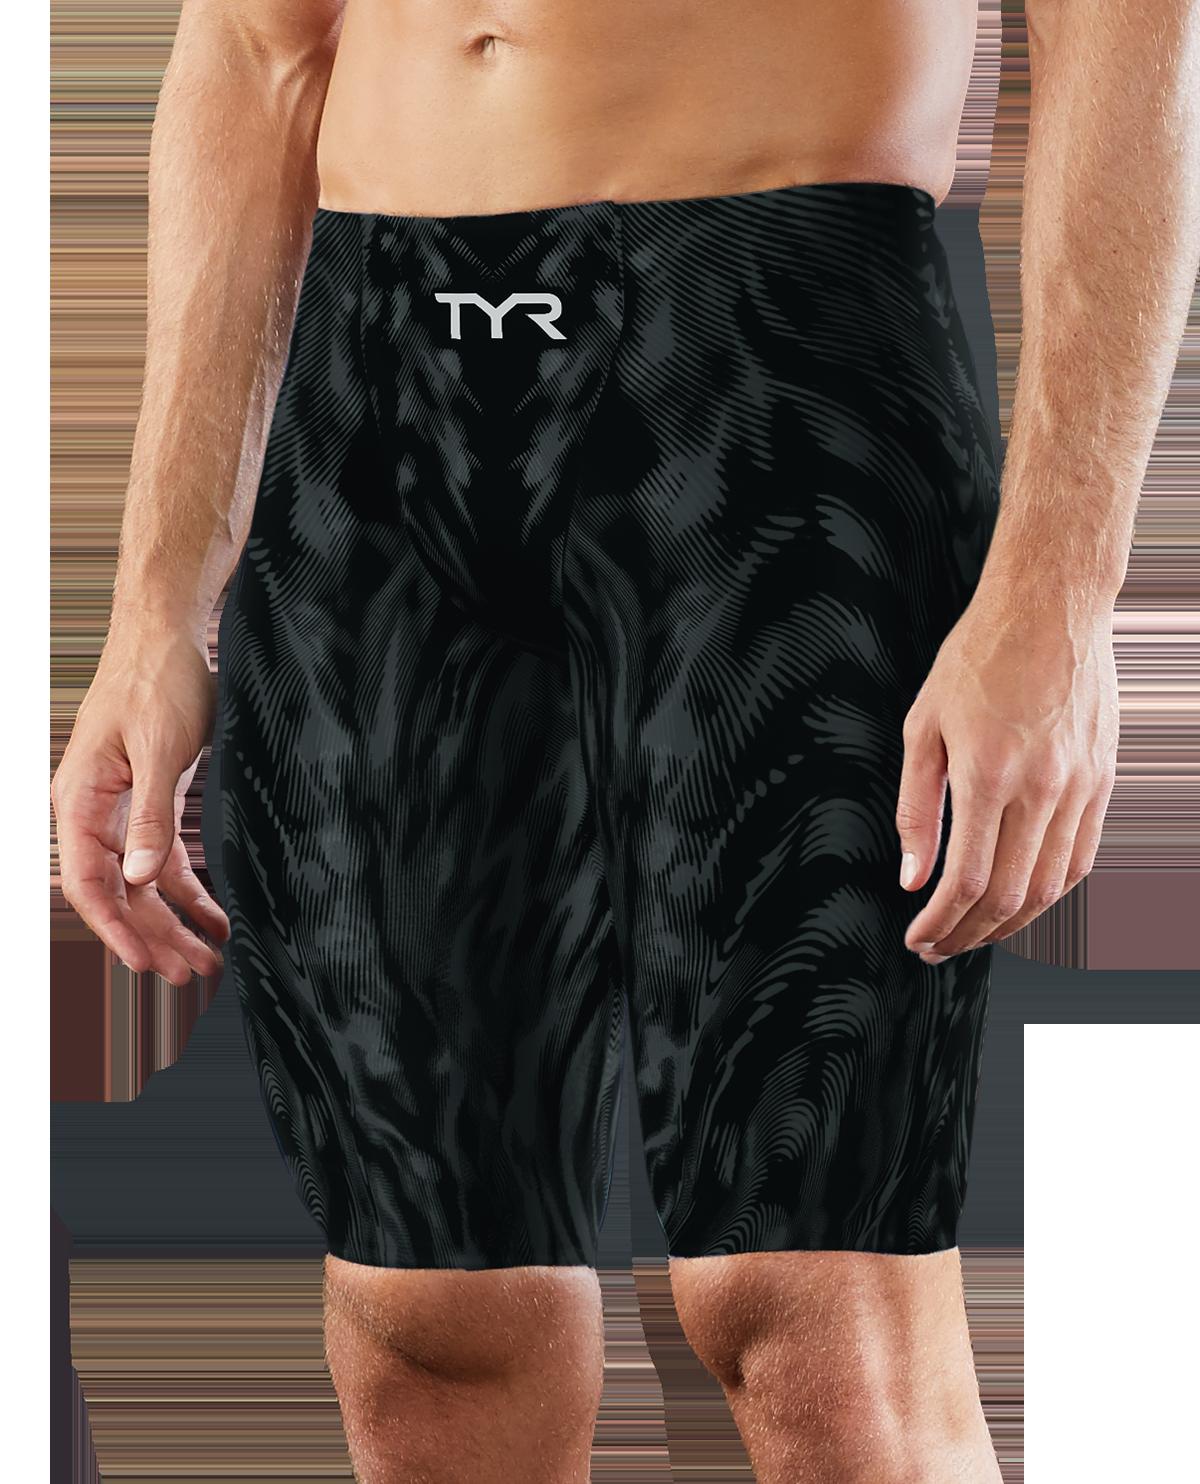 b24bebb55aa ... TYR Men s Venzo Genesis High Waist Jammer Swimsuit ...